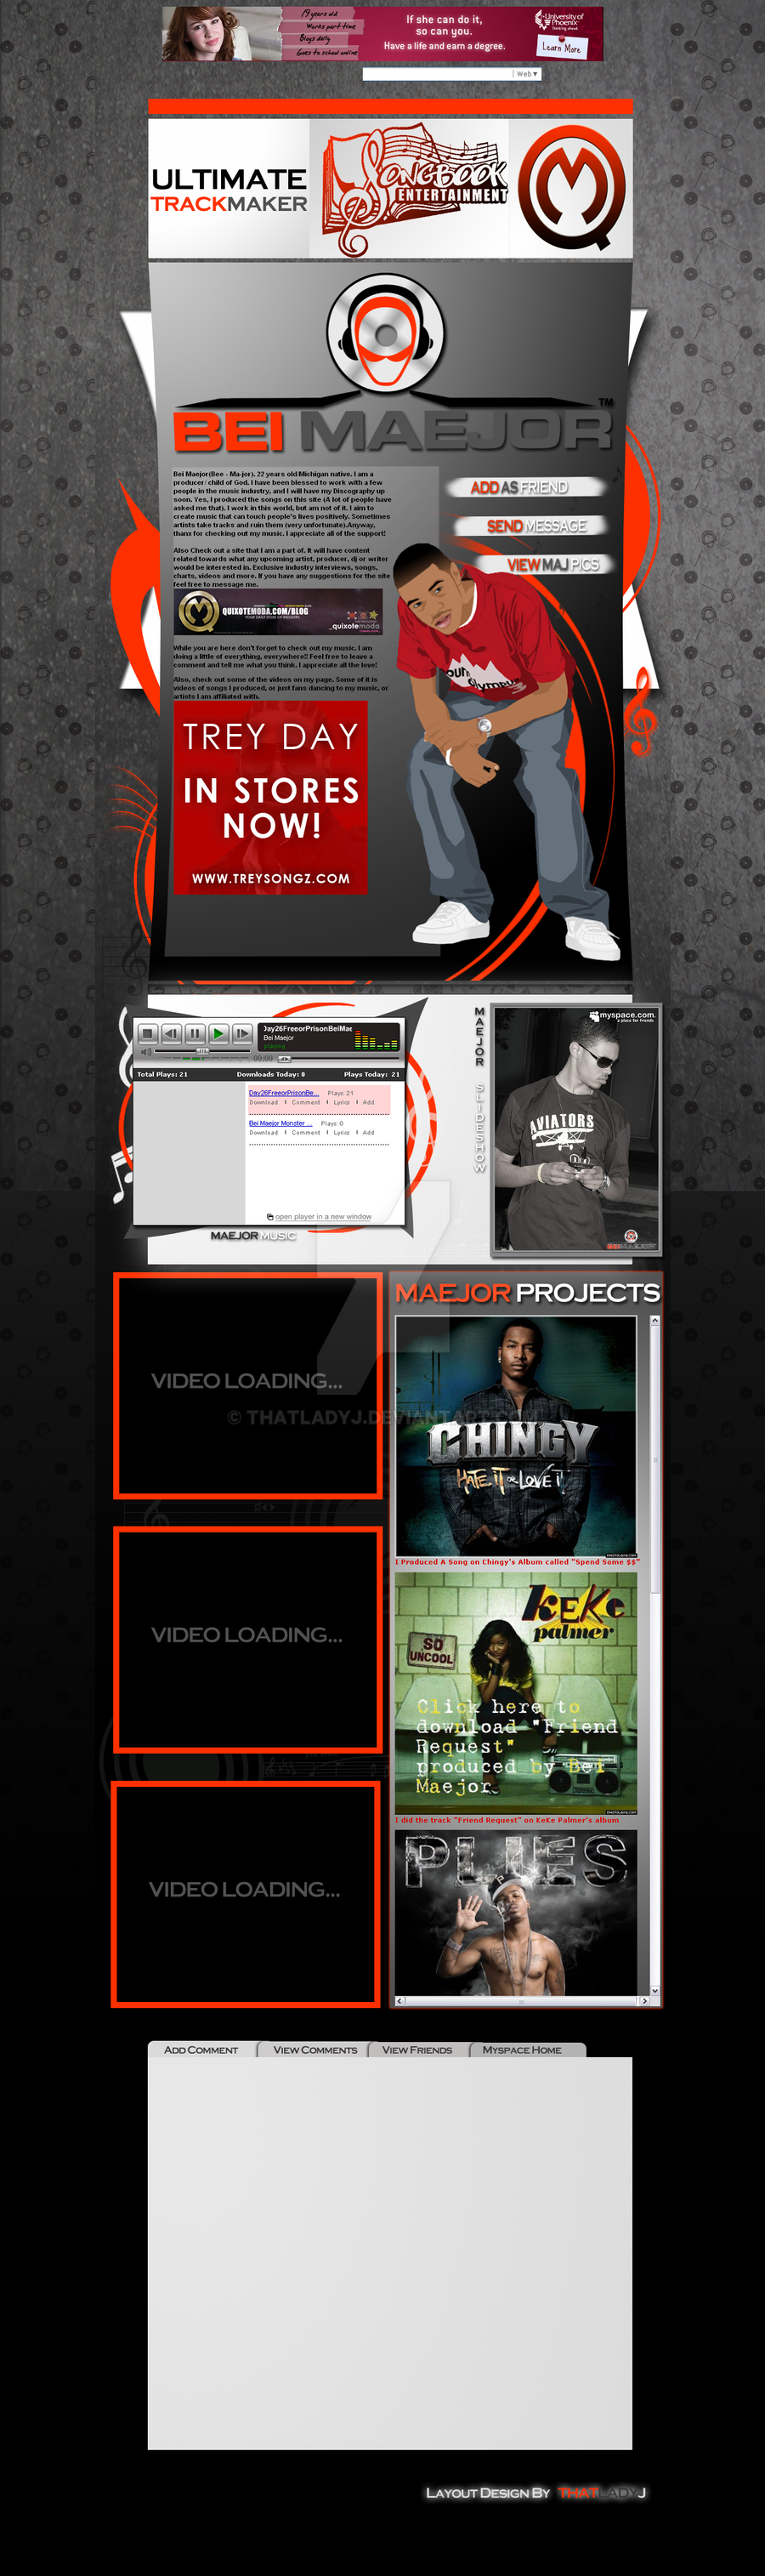 Myspace layouts that dont suck